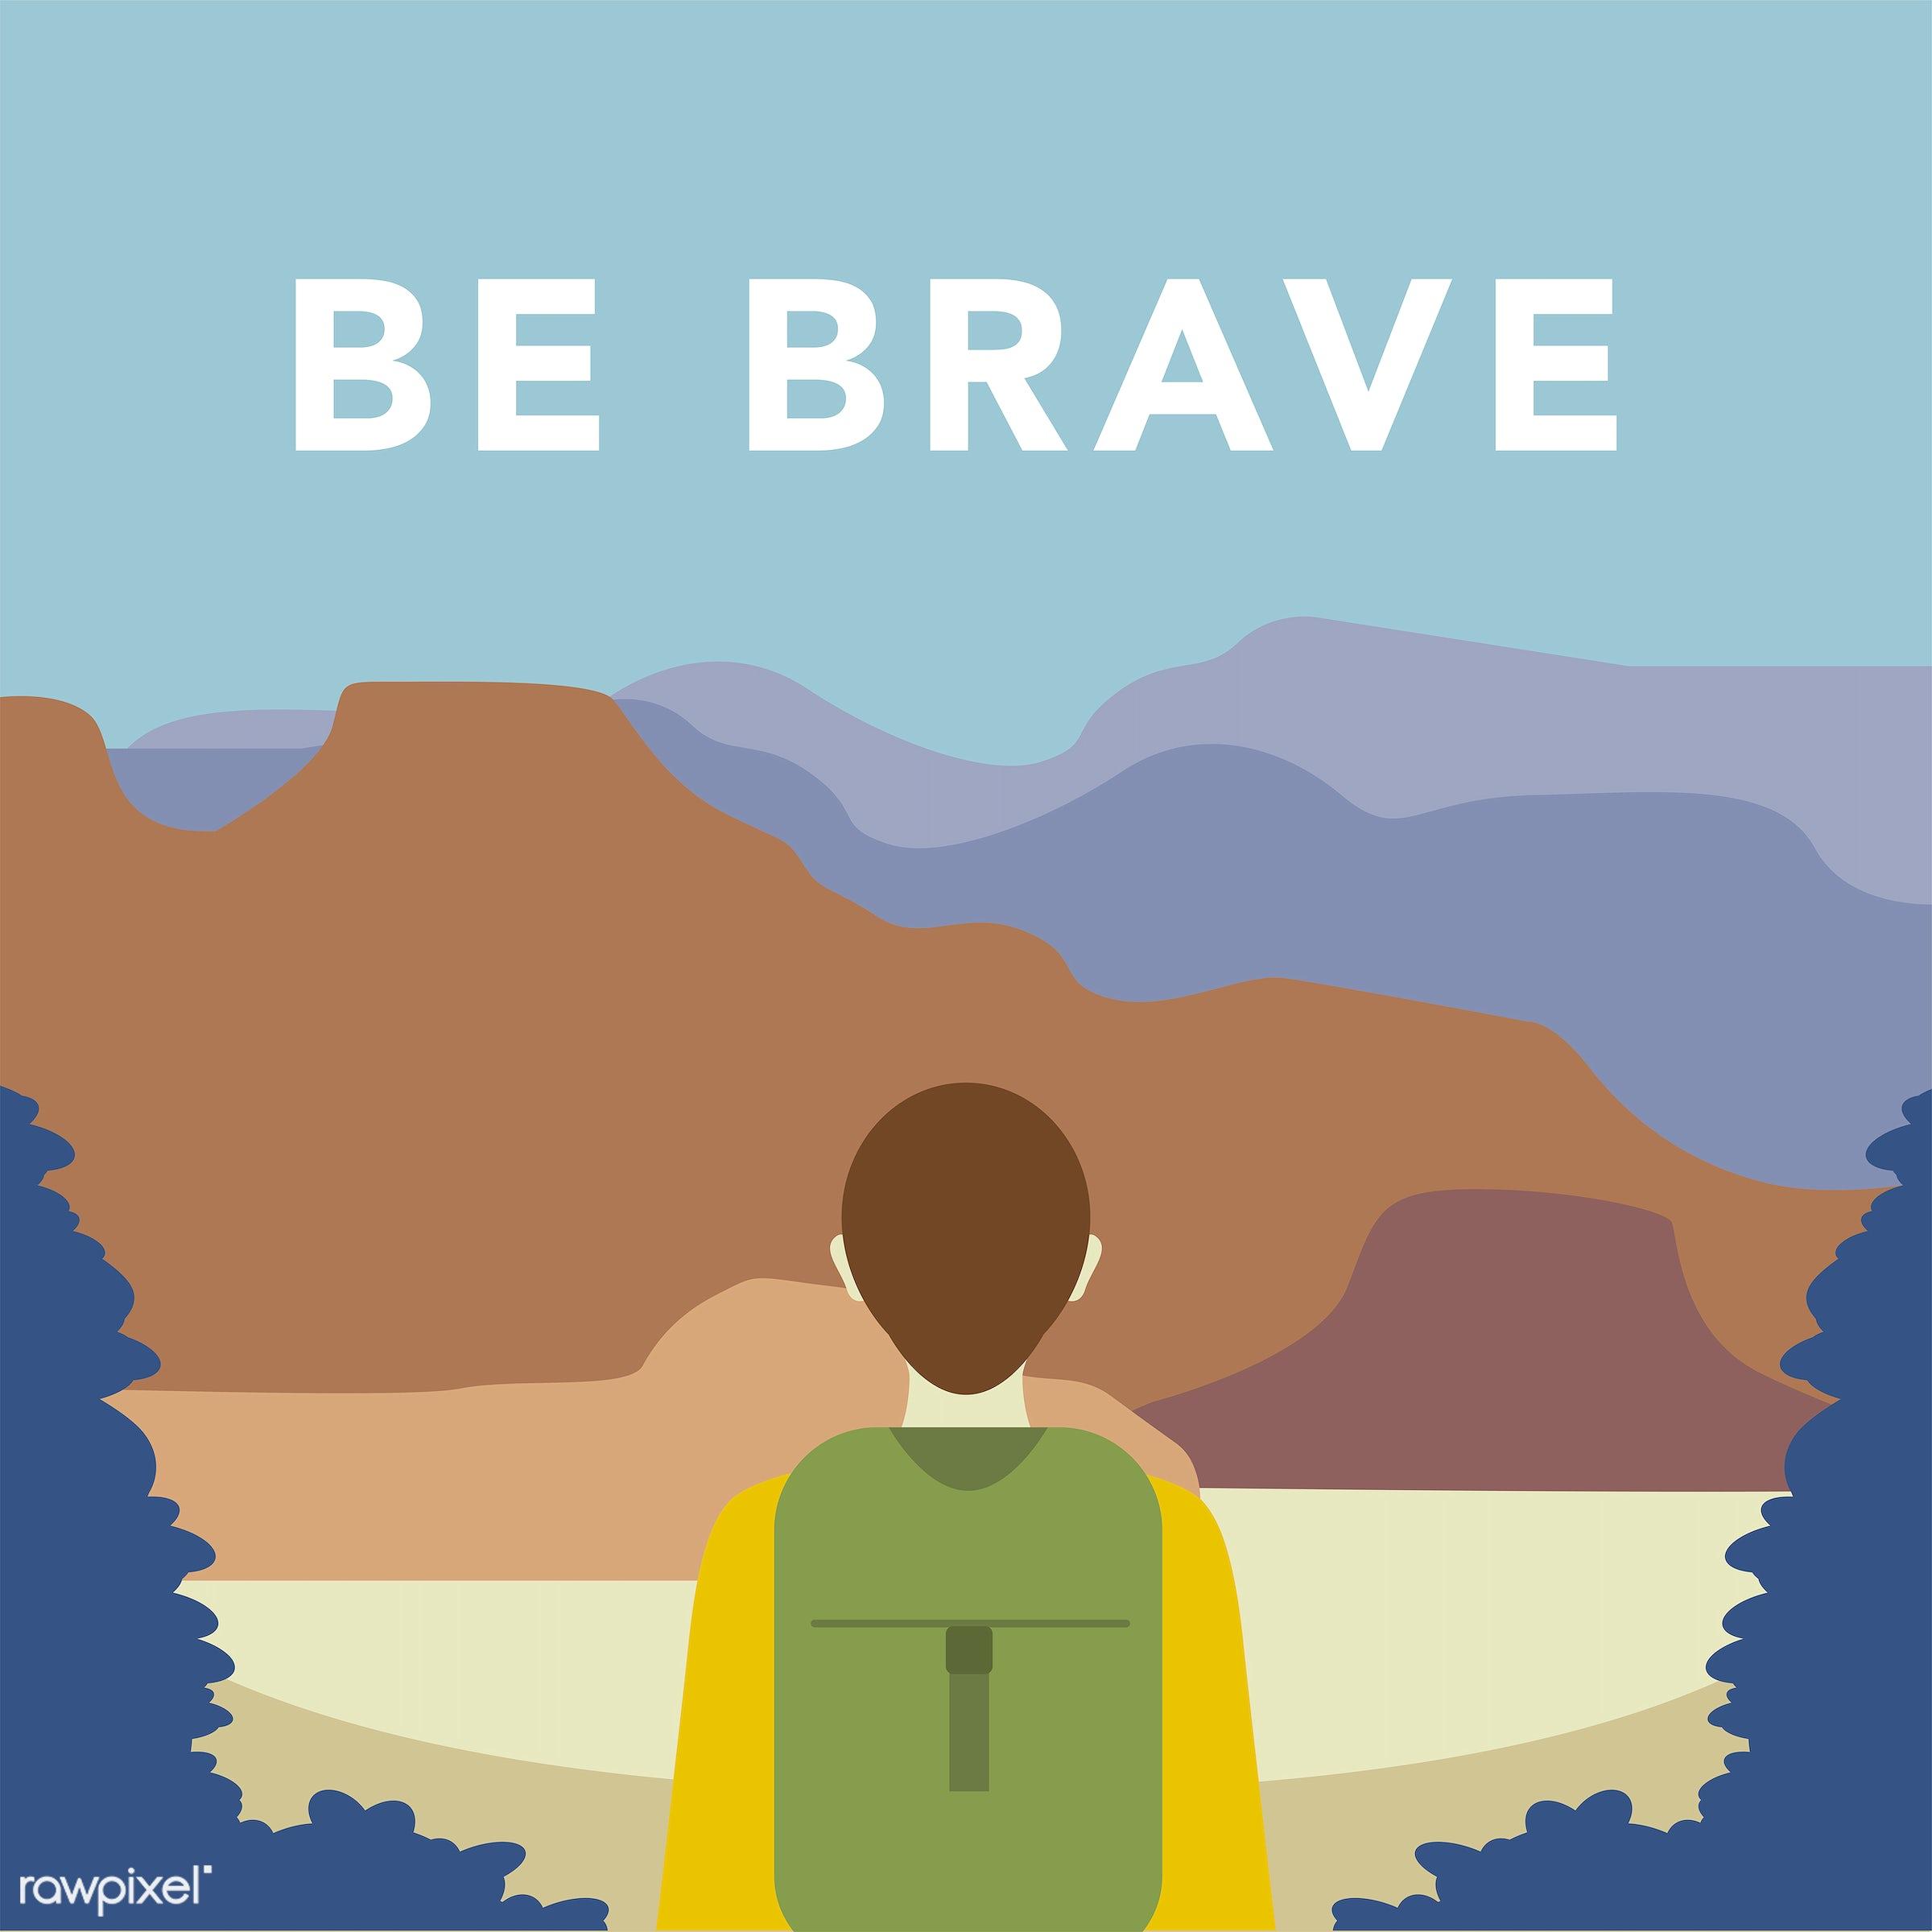 An explorer illustration  - vector, illustration, adventure, alone, be brave, blue, brave, expedition, explore, explorer,...